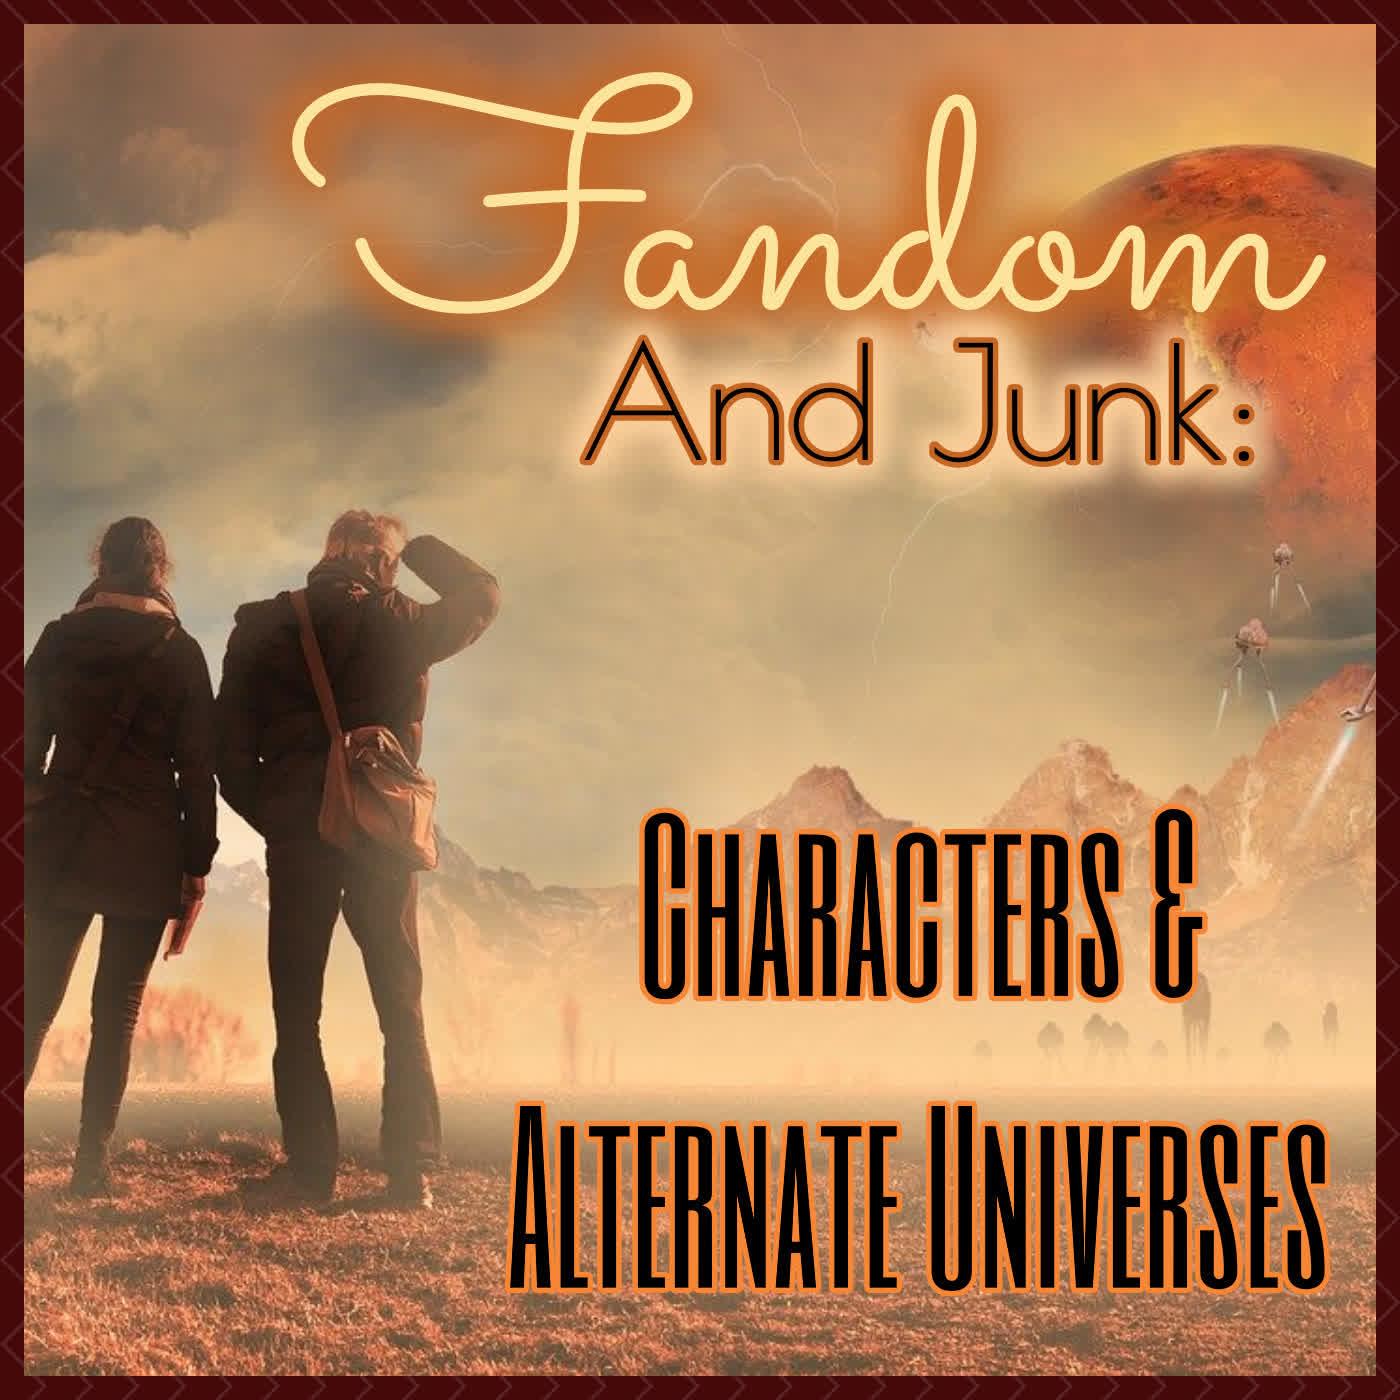 Fandom and Junk: Characterization & Alternate Universes